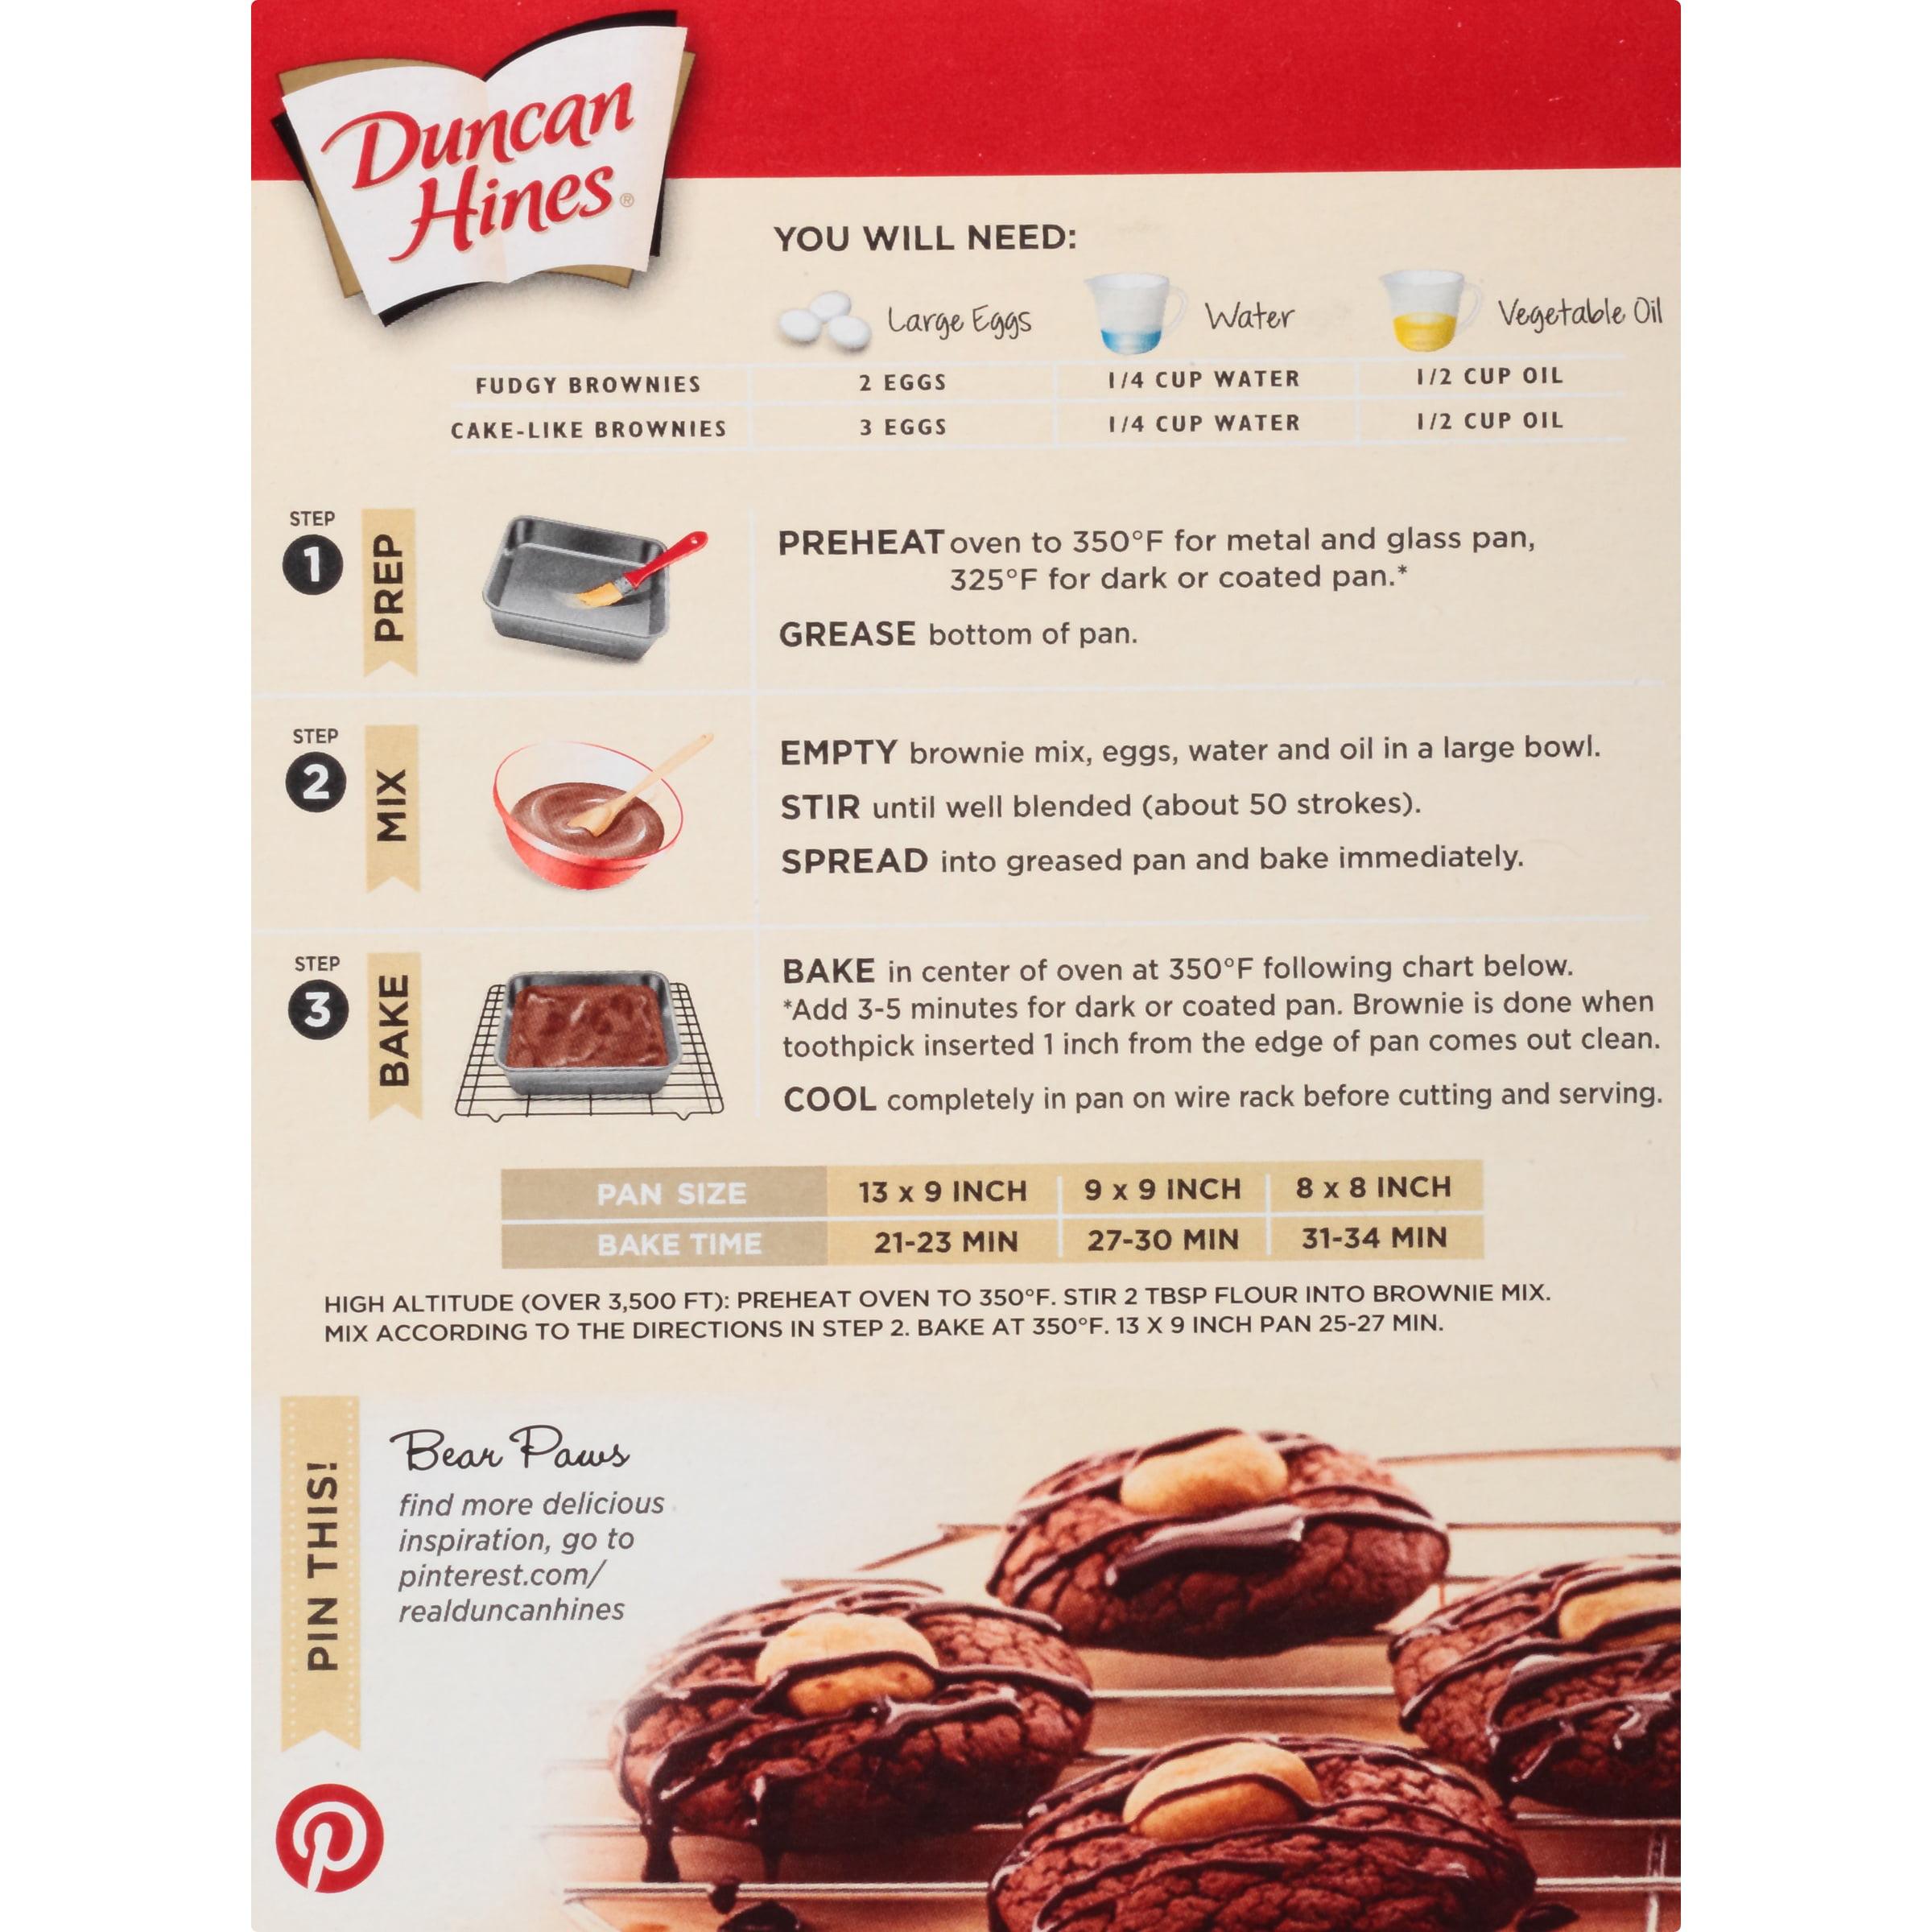 Duncan Hines Dark Chocolate Fudge Cake Mix Ingredients